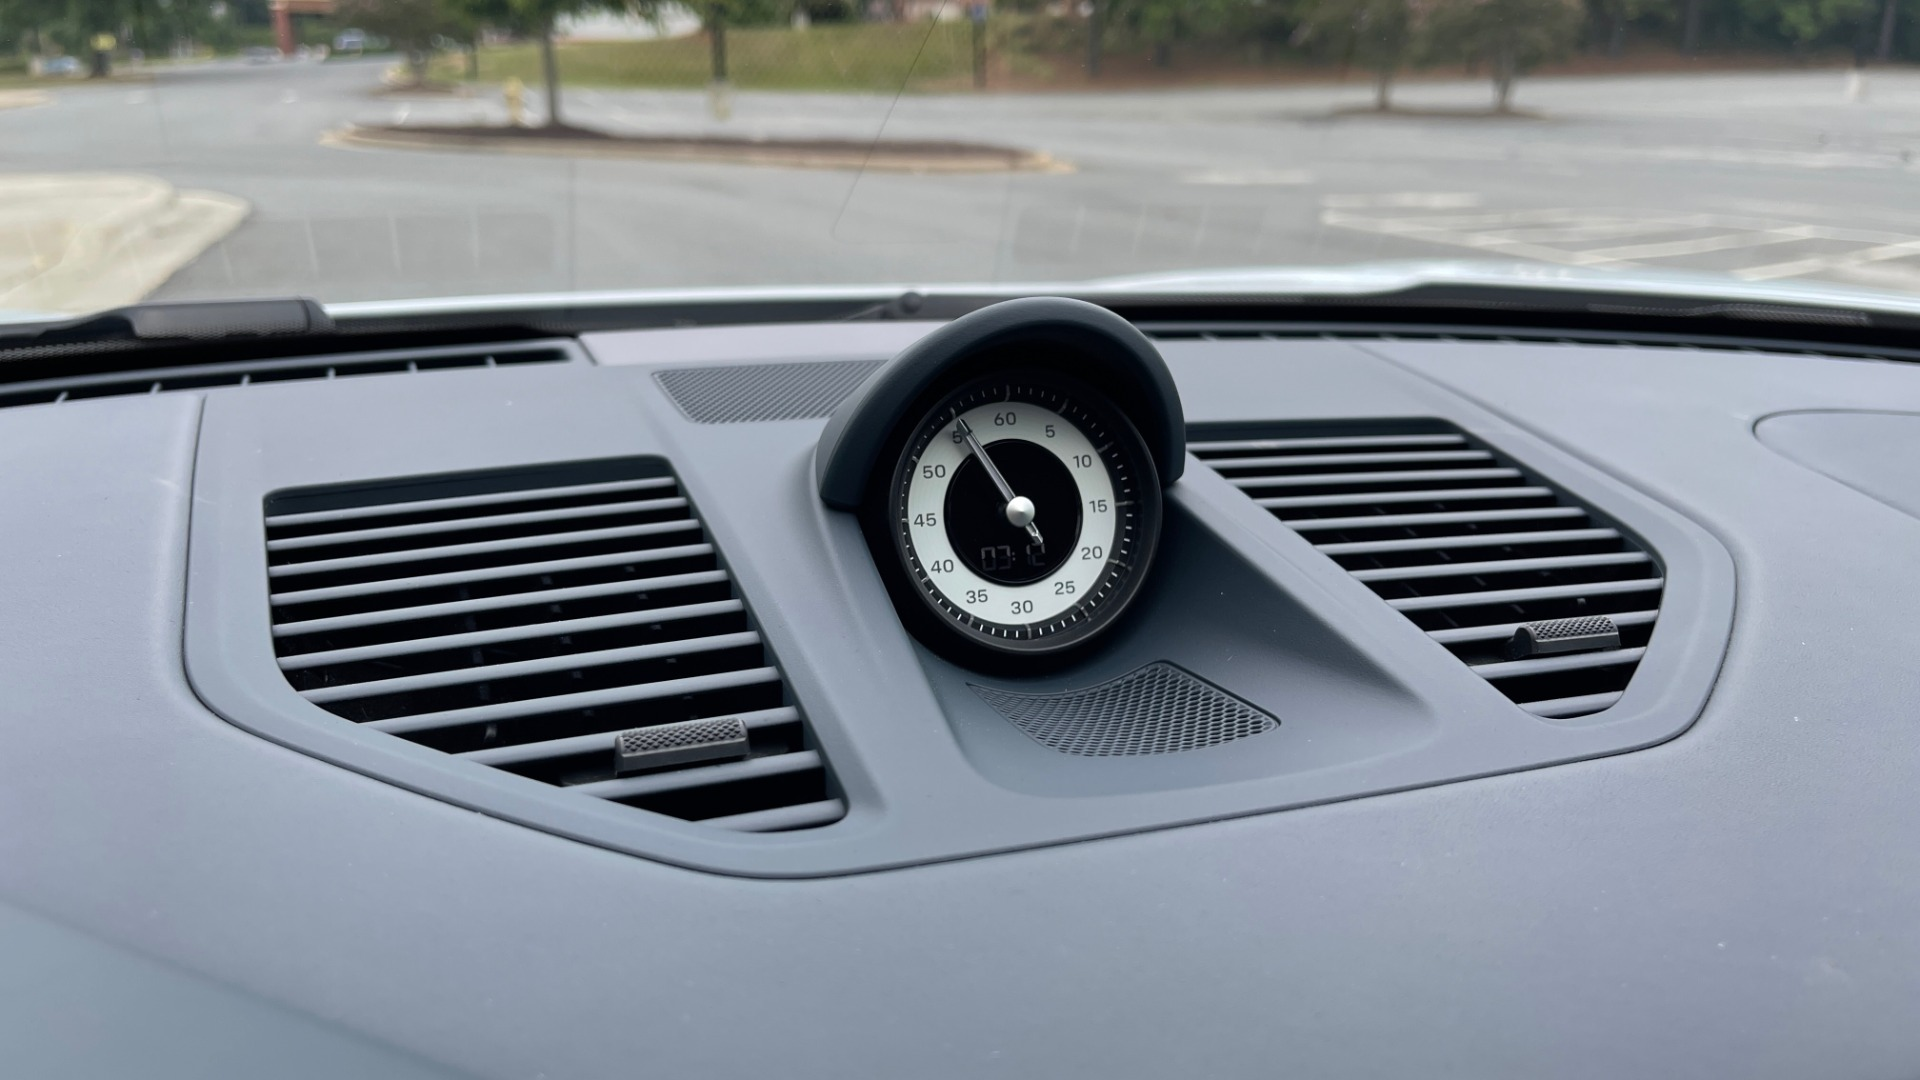 Used 2020 Porsche 911 CARRERA 4S CABRIOLET PREMIUM SPORT PKG / NAV / BOSE / LIGHT DESIGN PKG for sale $167,595 at Formula Imports in Charlotte NC 28227 56